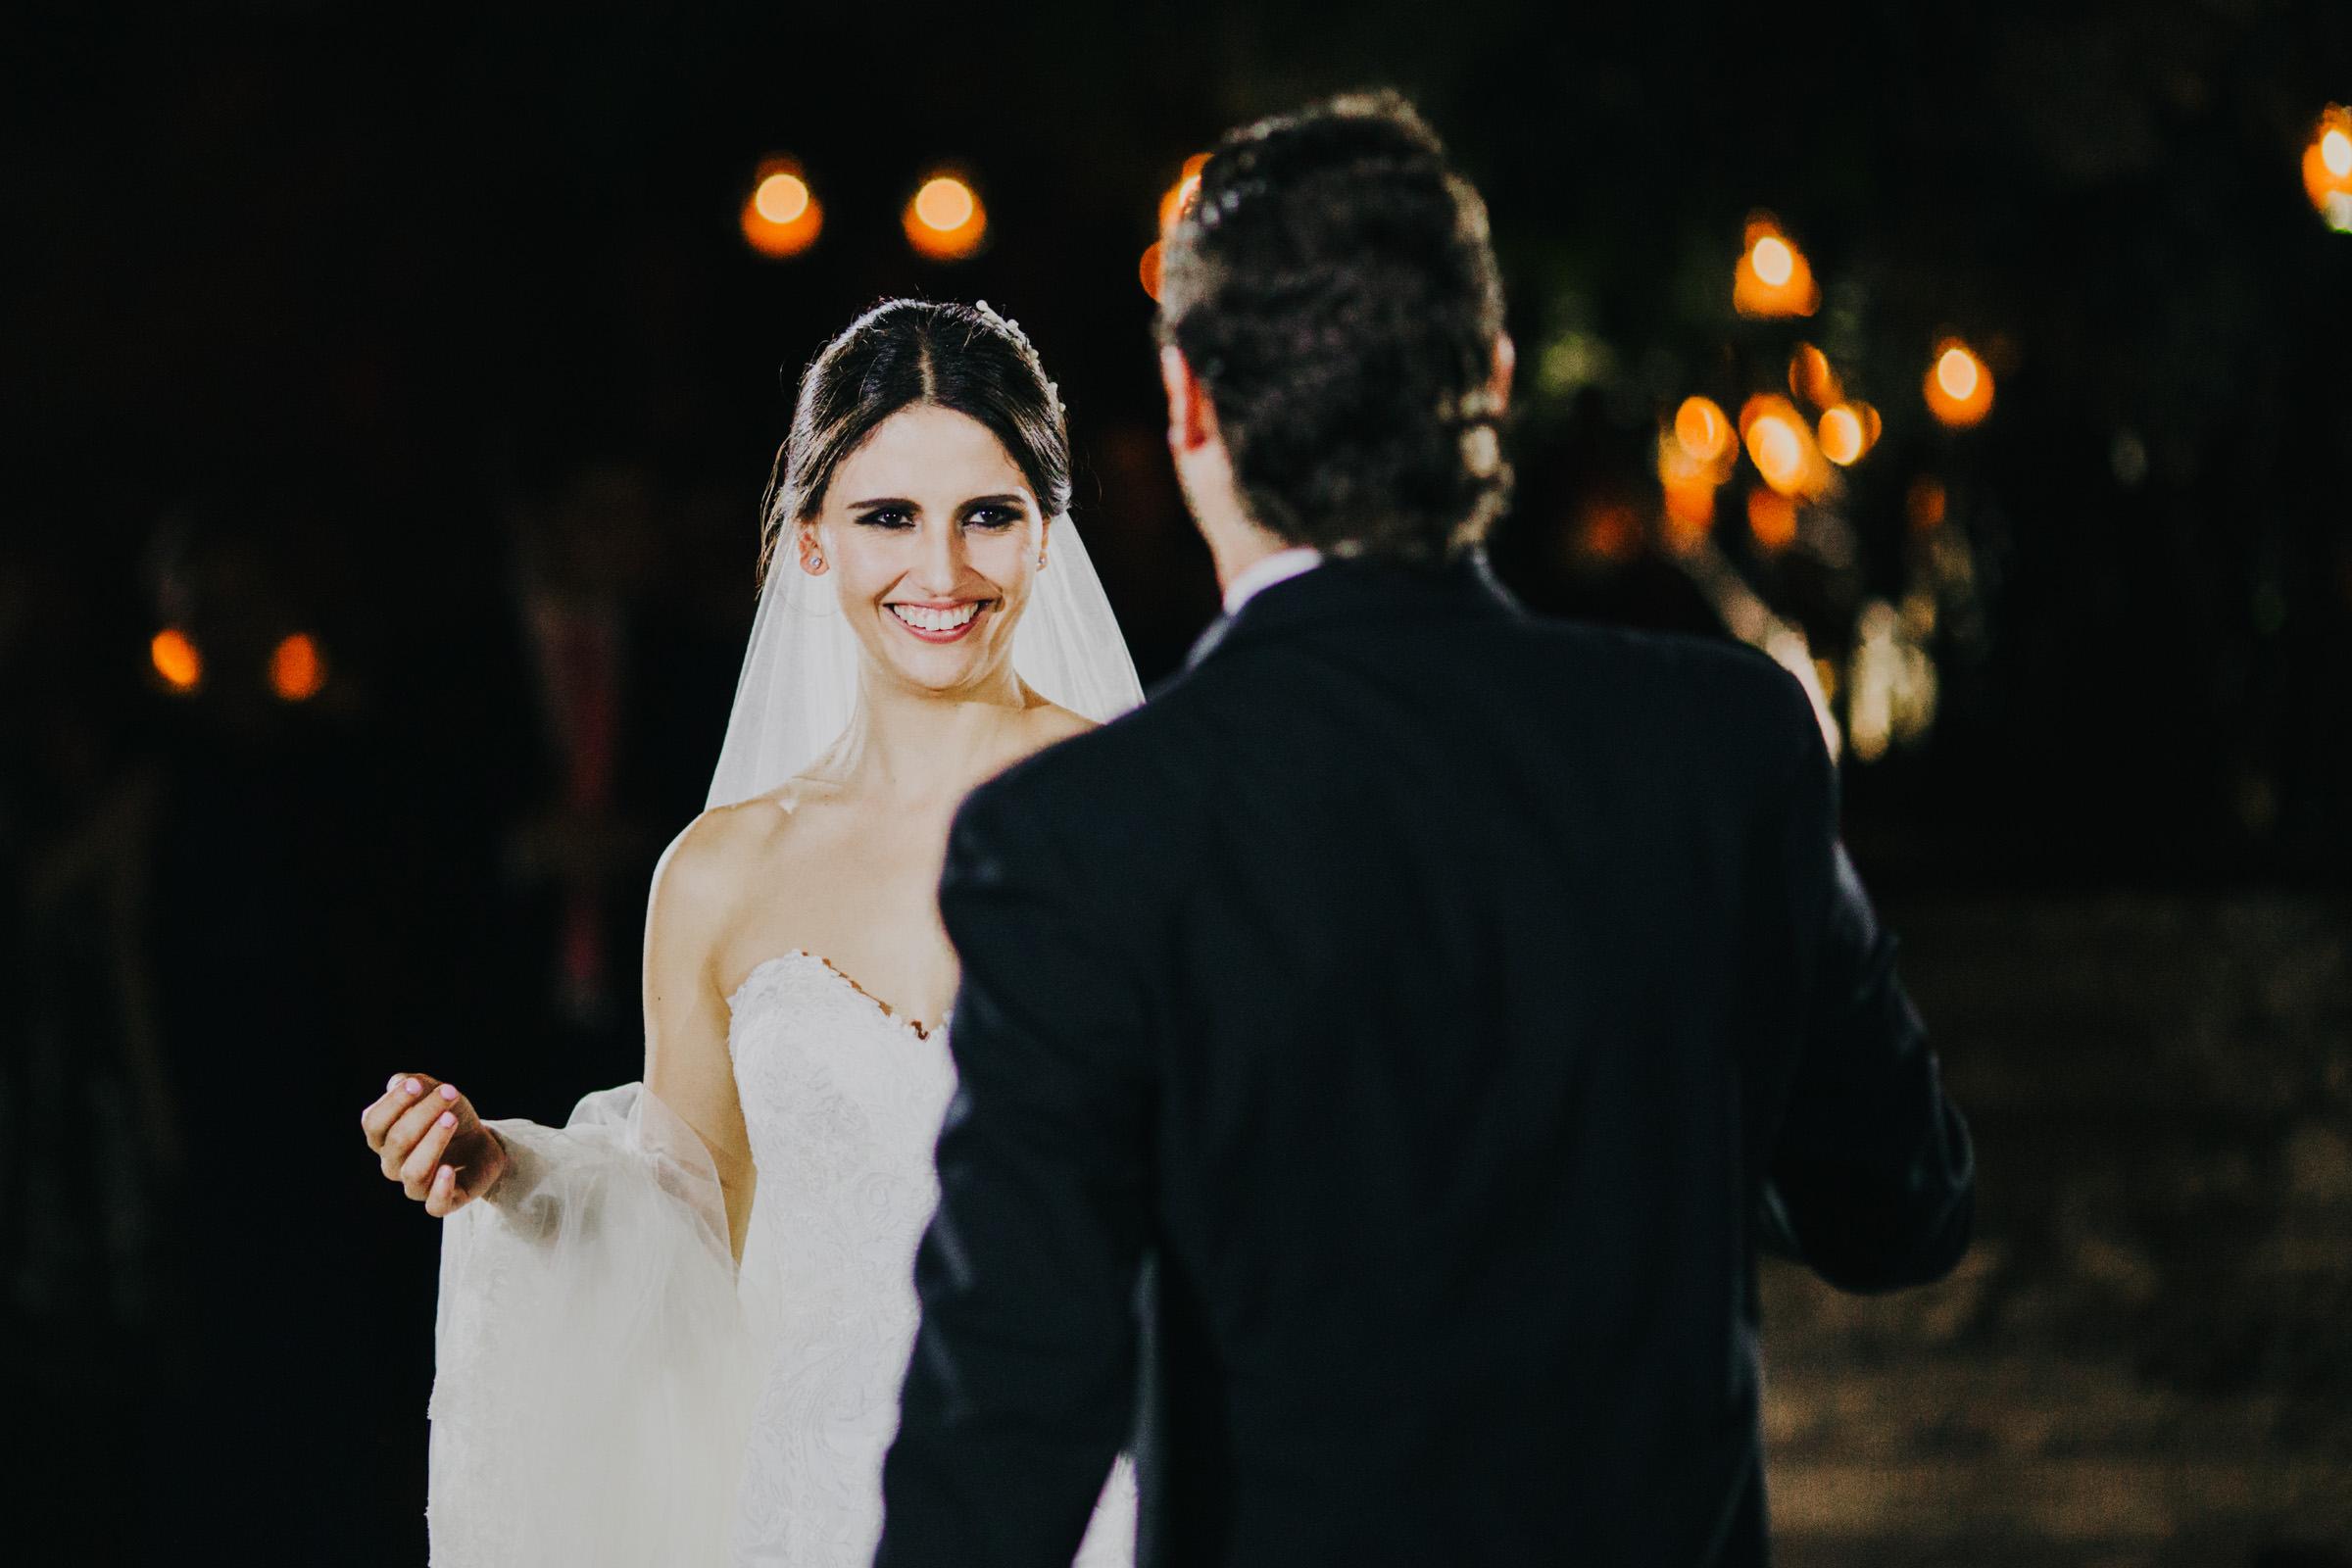 irapuato-boda-fotografia-jardines-alcalde-guanajuato-paulina-juan-pedro--139.jpg